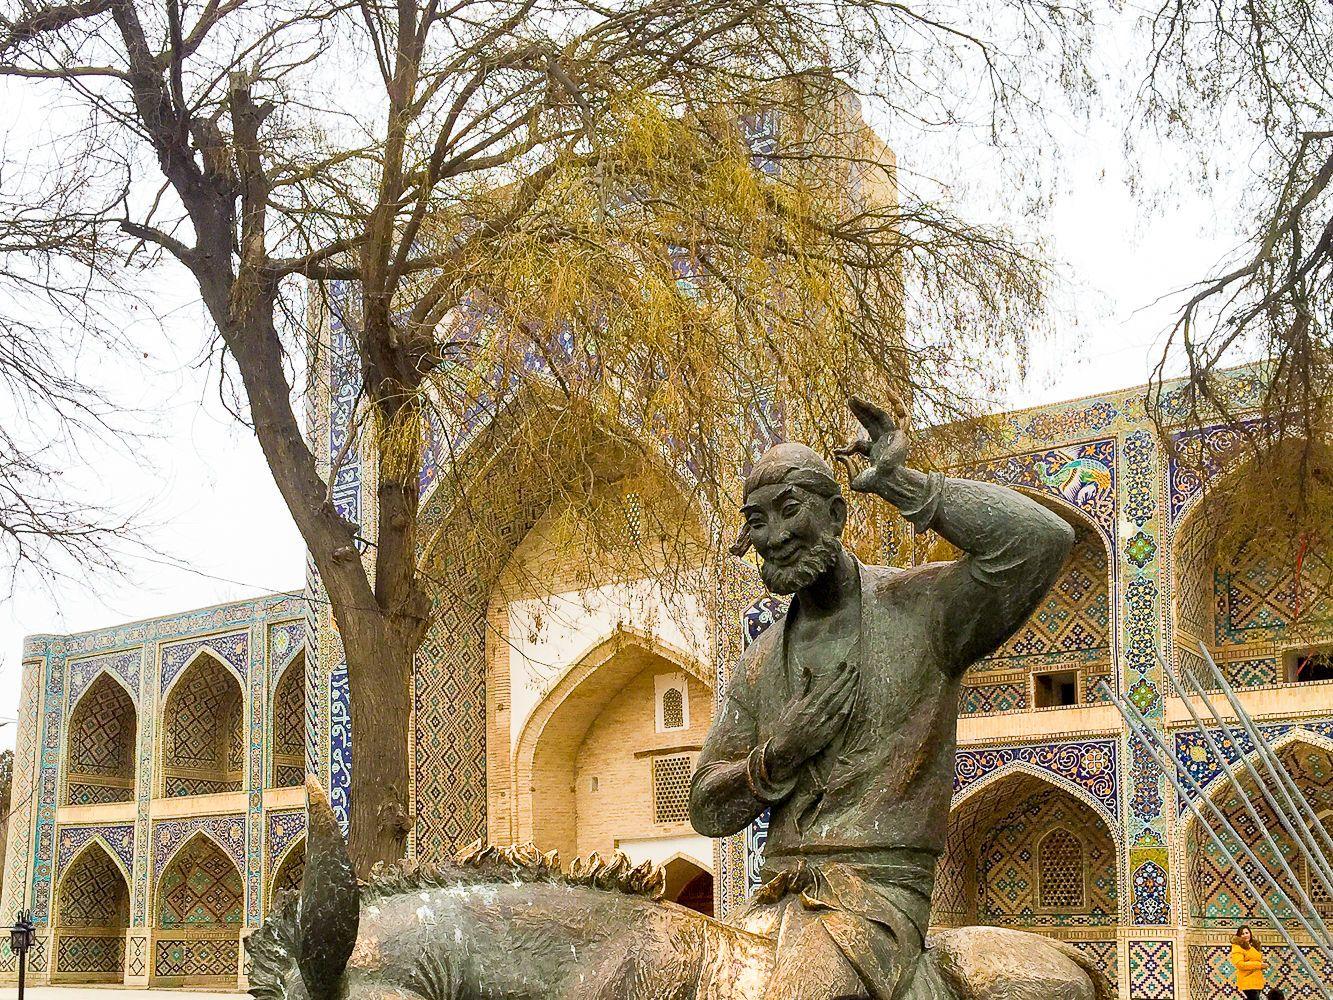 Hodja Nasredin statue in Bukhara, Uzbekistan travel, Central Asia Tourism